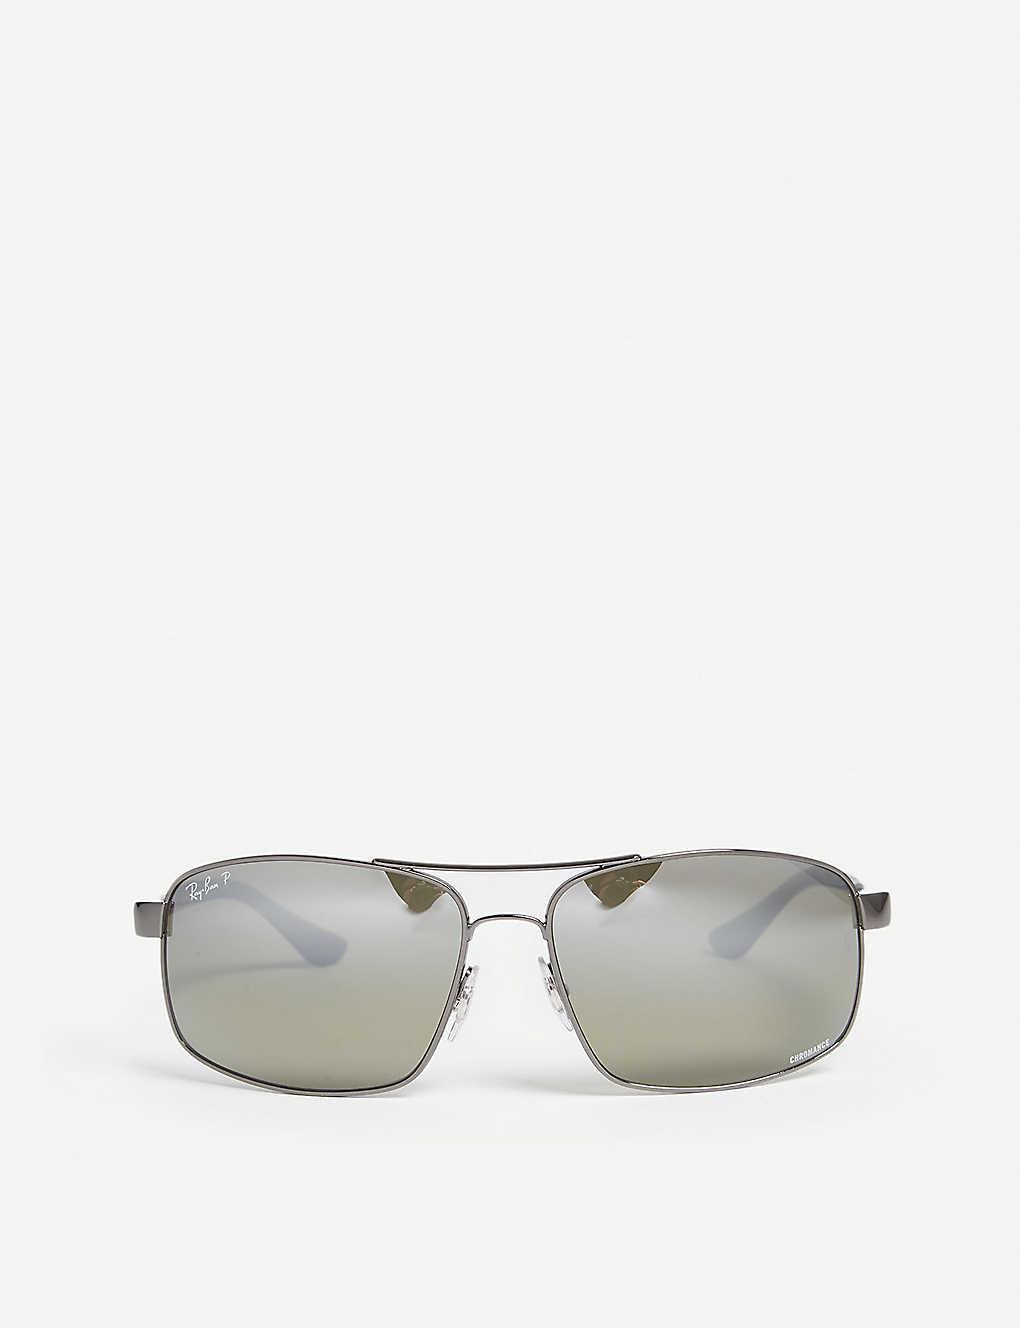 07d613fd97f2 RAY-BAN - Rb3604ch Chromance square-frame sunglasses | Selfridges.com